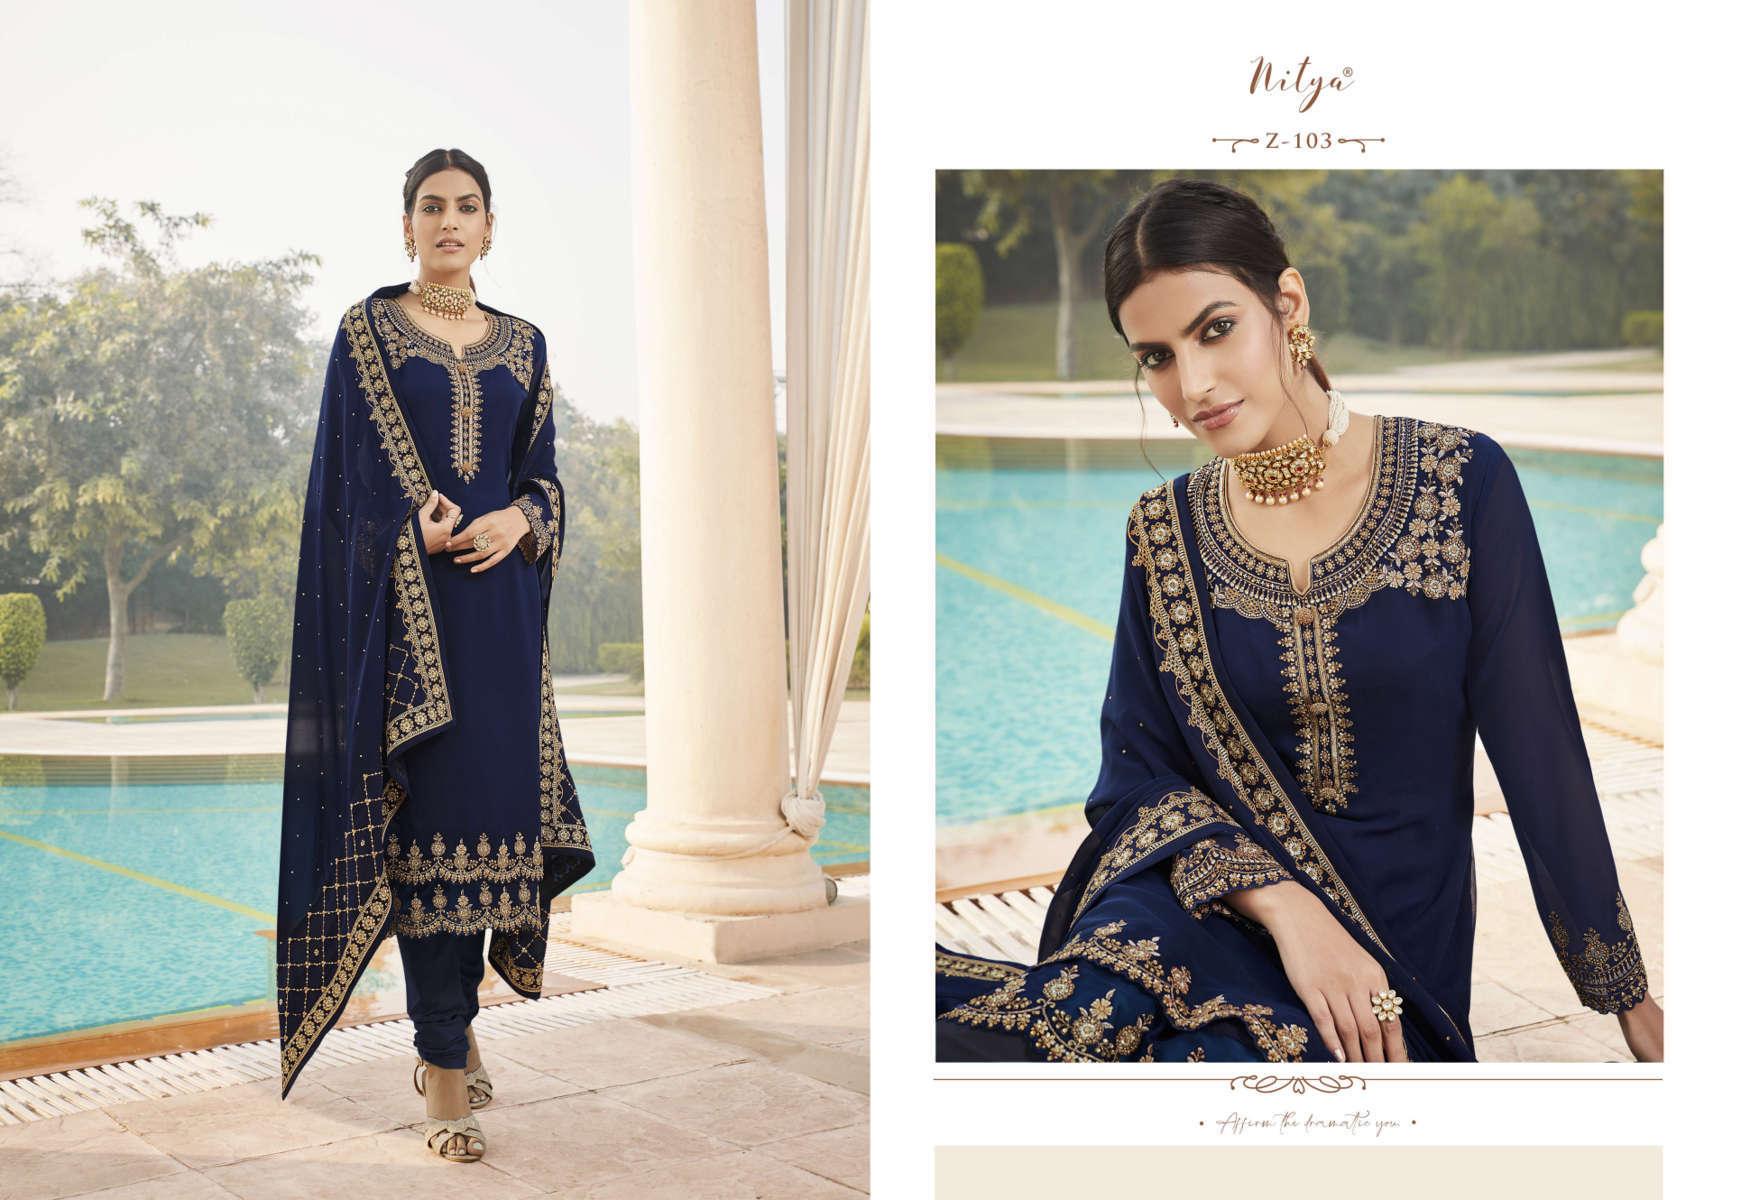 Lt Fabrics Nitya Zyrah Salwar Suit Wholesale Catalog 5 Pcs 6 1 - Lt Fabrics Nitya Zyrah Salwar Suit Wholesale Catalog 5 Pcs